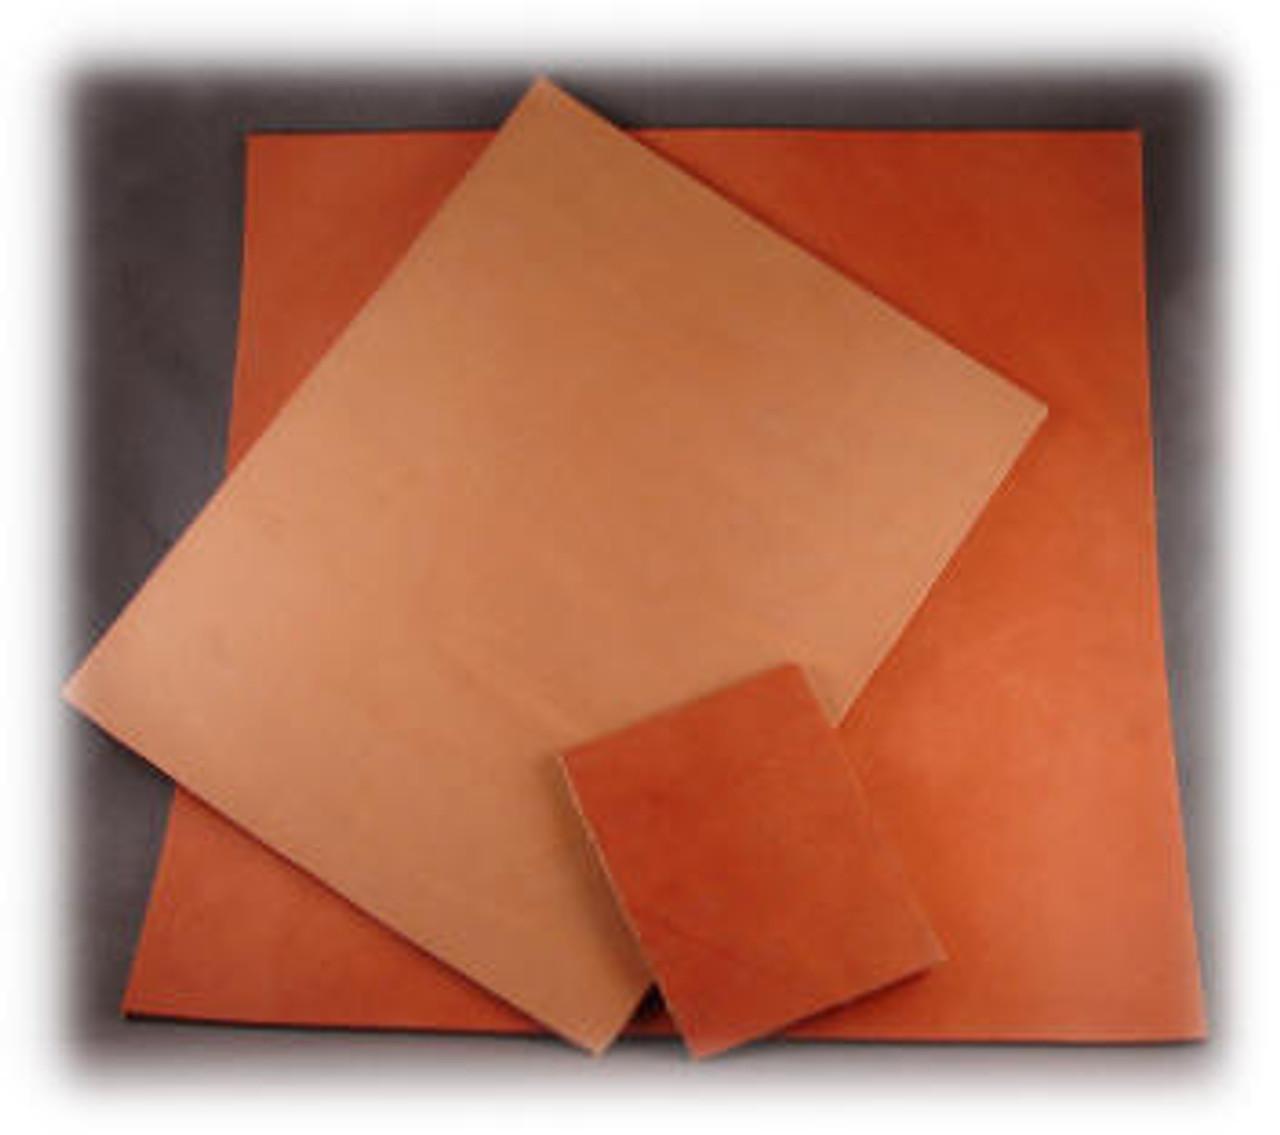 "Rich Tan Leather Blank, 12"" x 12"" x 1/8"""